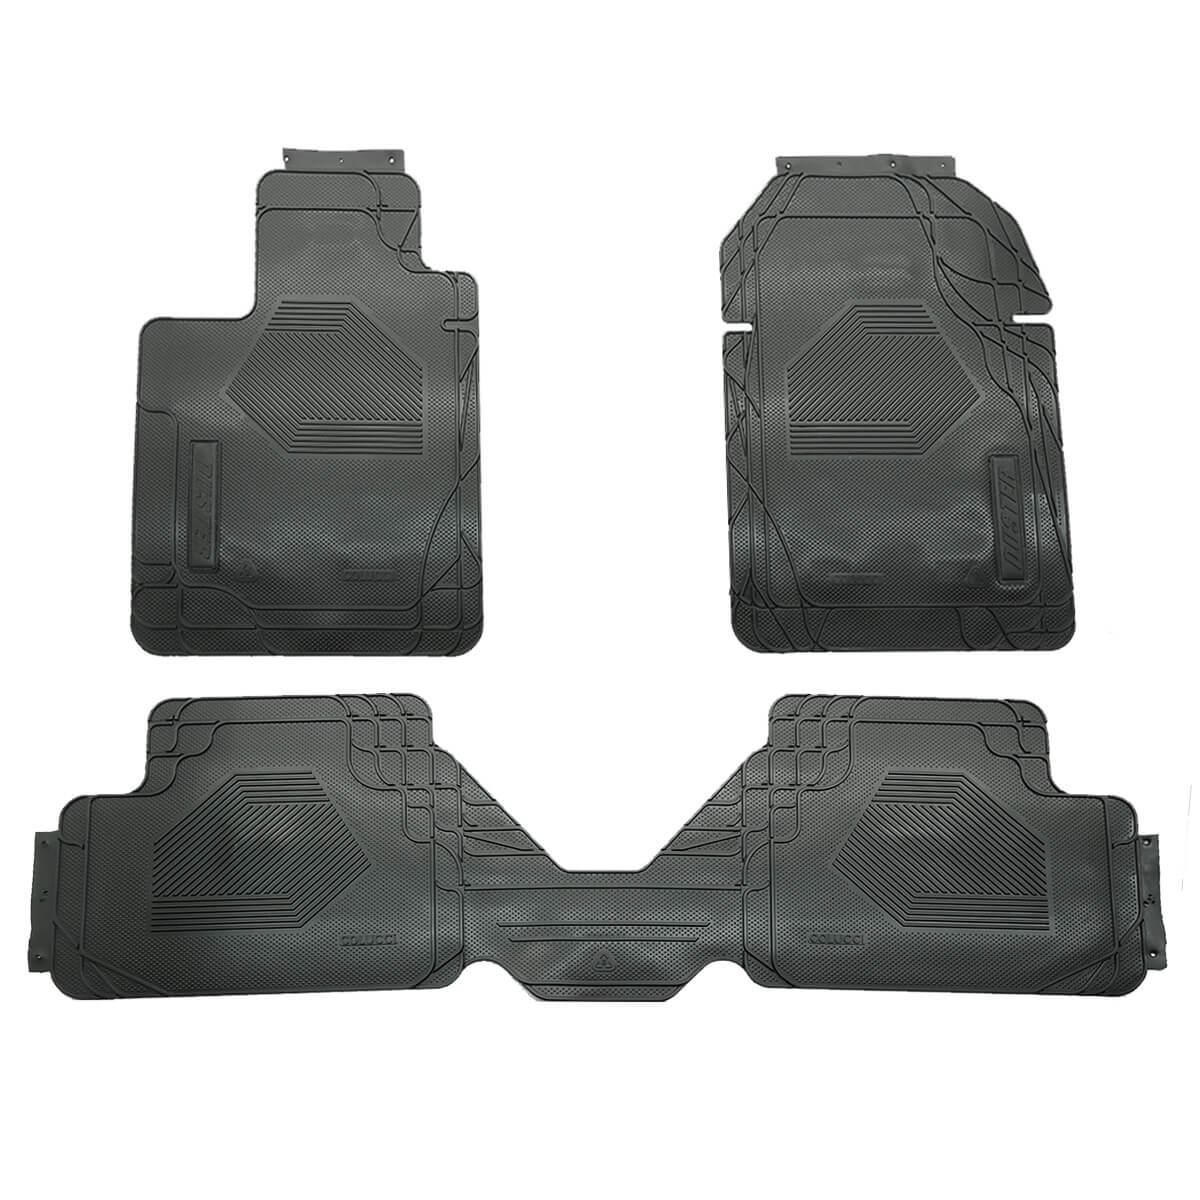 Tapete personalizado PVC flexível Duster 2012 a 2017 ou Duster Oroch 2016 2017